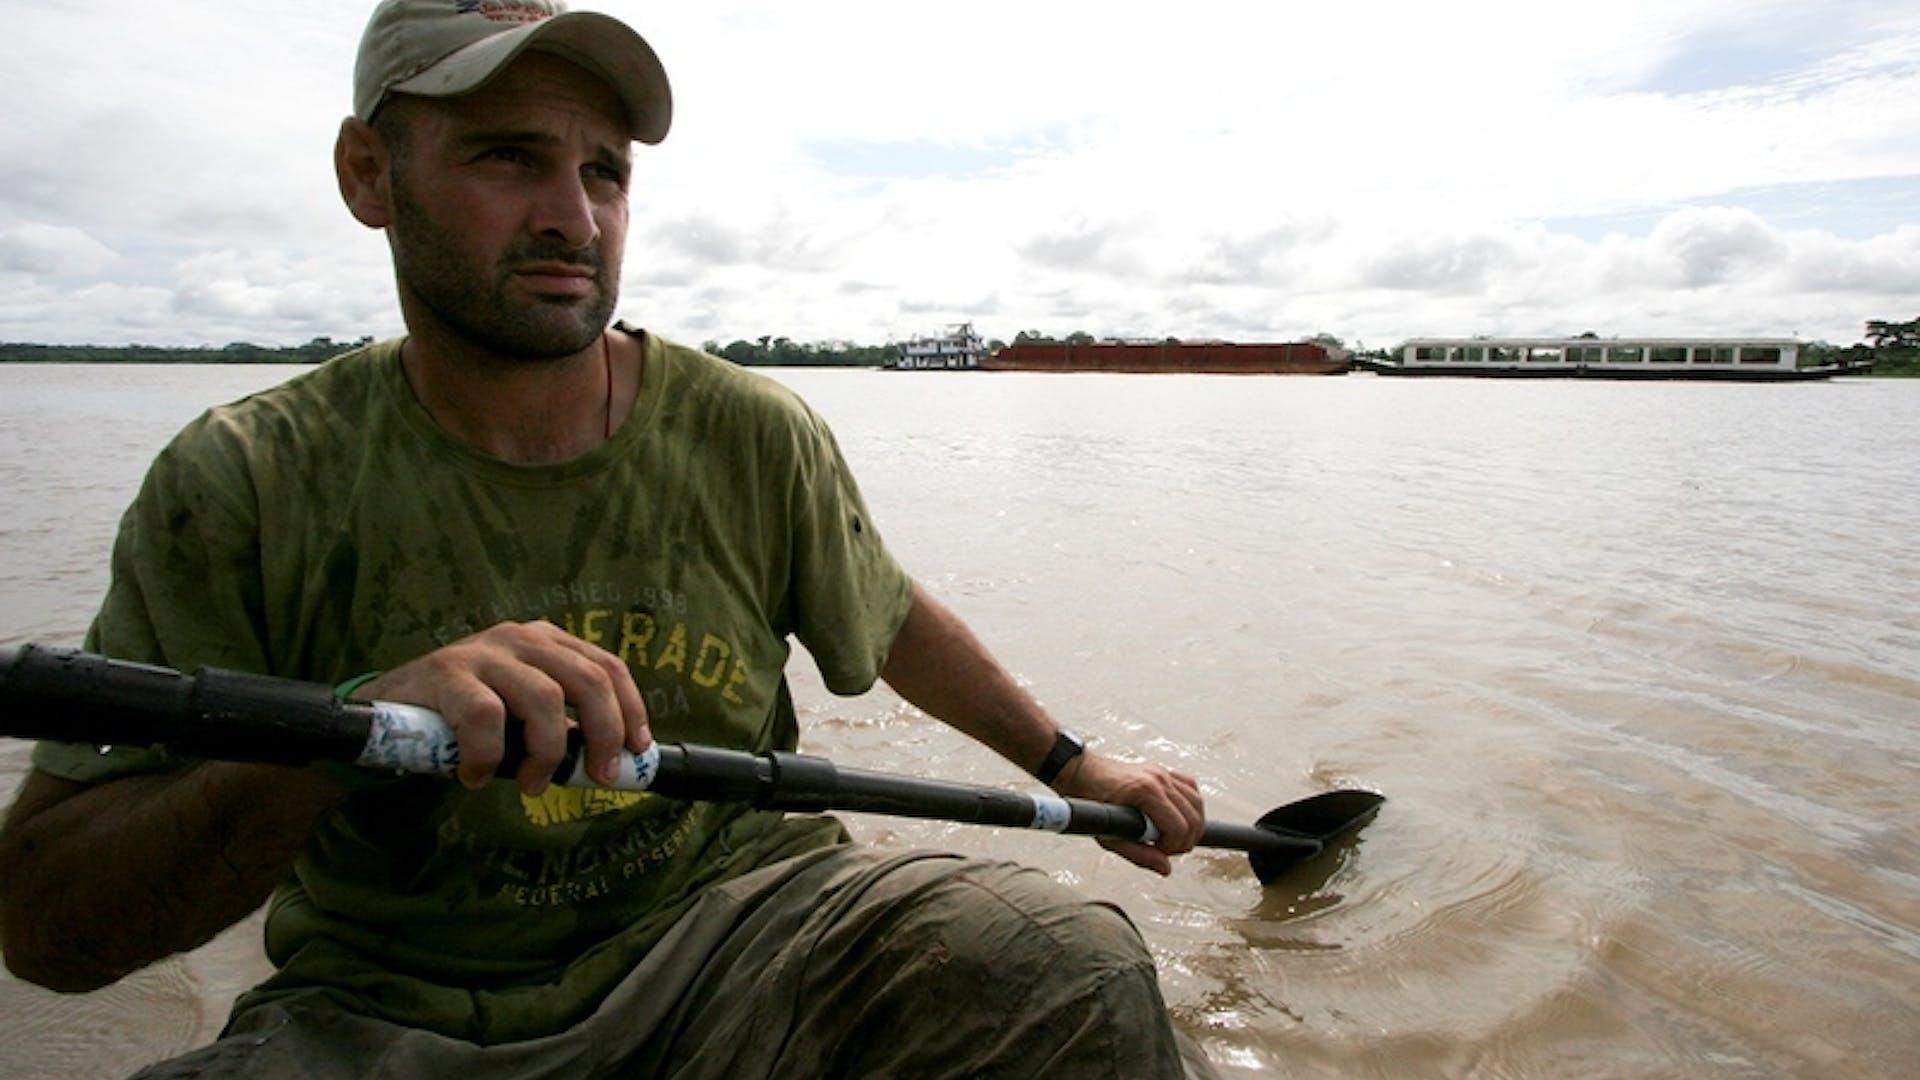 Ed Stafford Walking The Amazon courtesy of Keith Ducantel 3 1